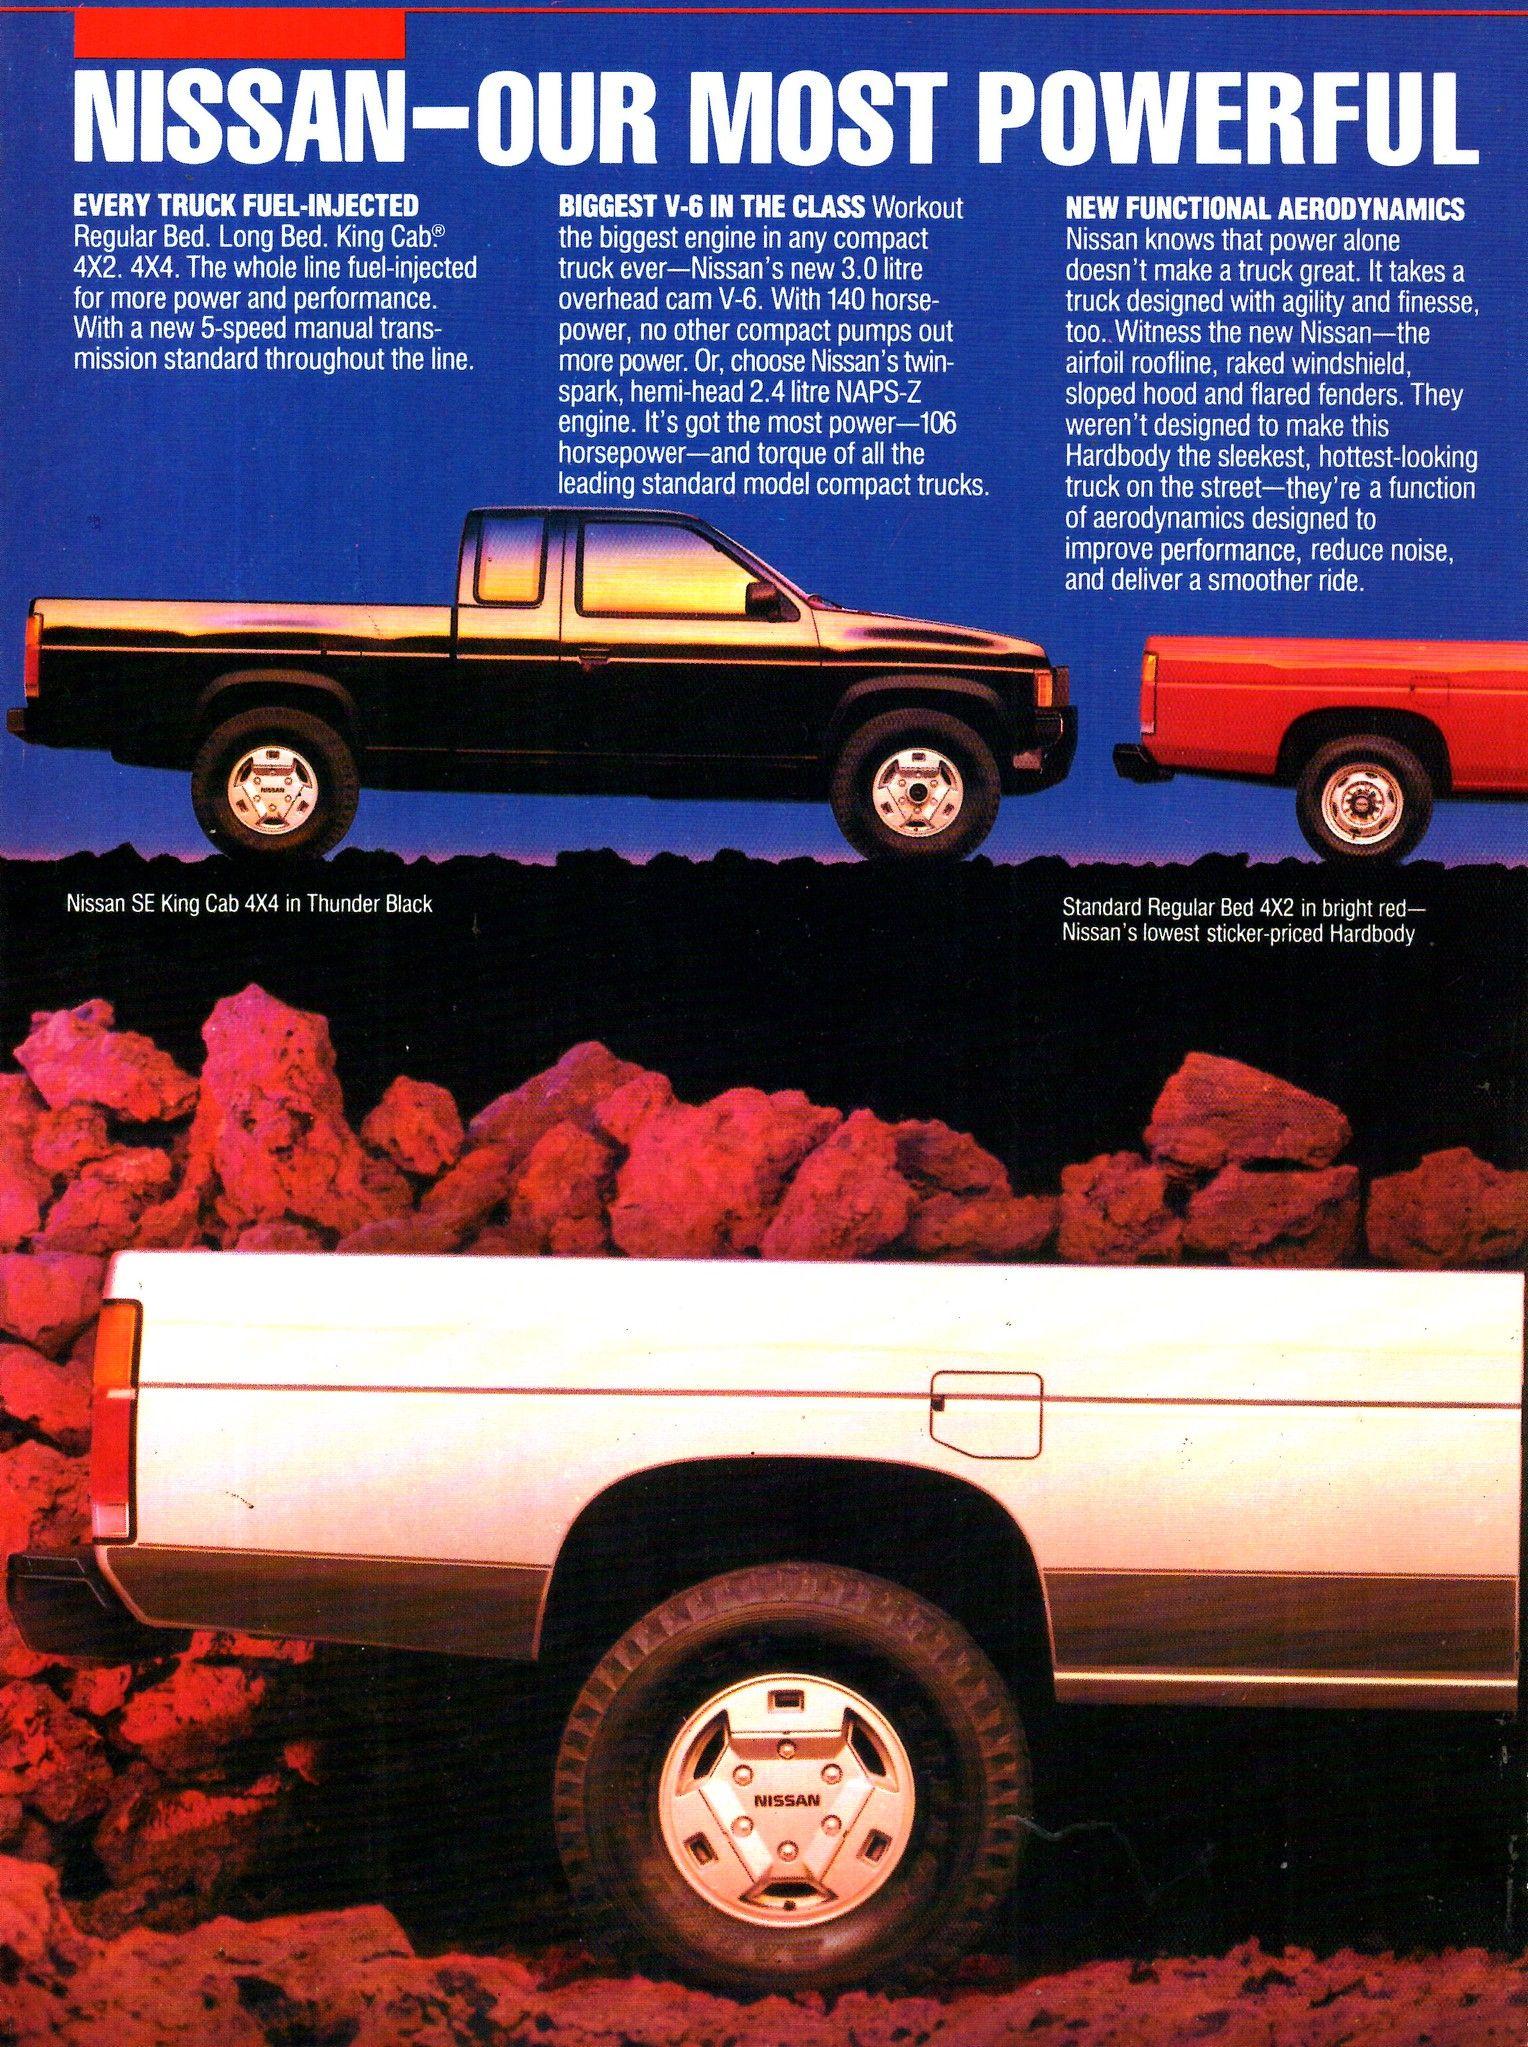 1986 Nissan Hardbodies Pickup Trucks Standaard Bed 4x2 Long Bed 4x2 King Cab 4x2 Regular Bed 4x4 Long Bed 4x4 King Cab 4x4 Page 4 Usa Original Magazine Advertis Nissan Terrano